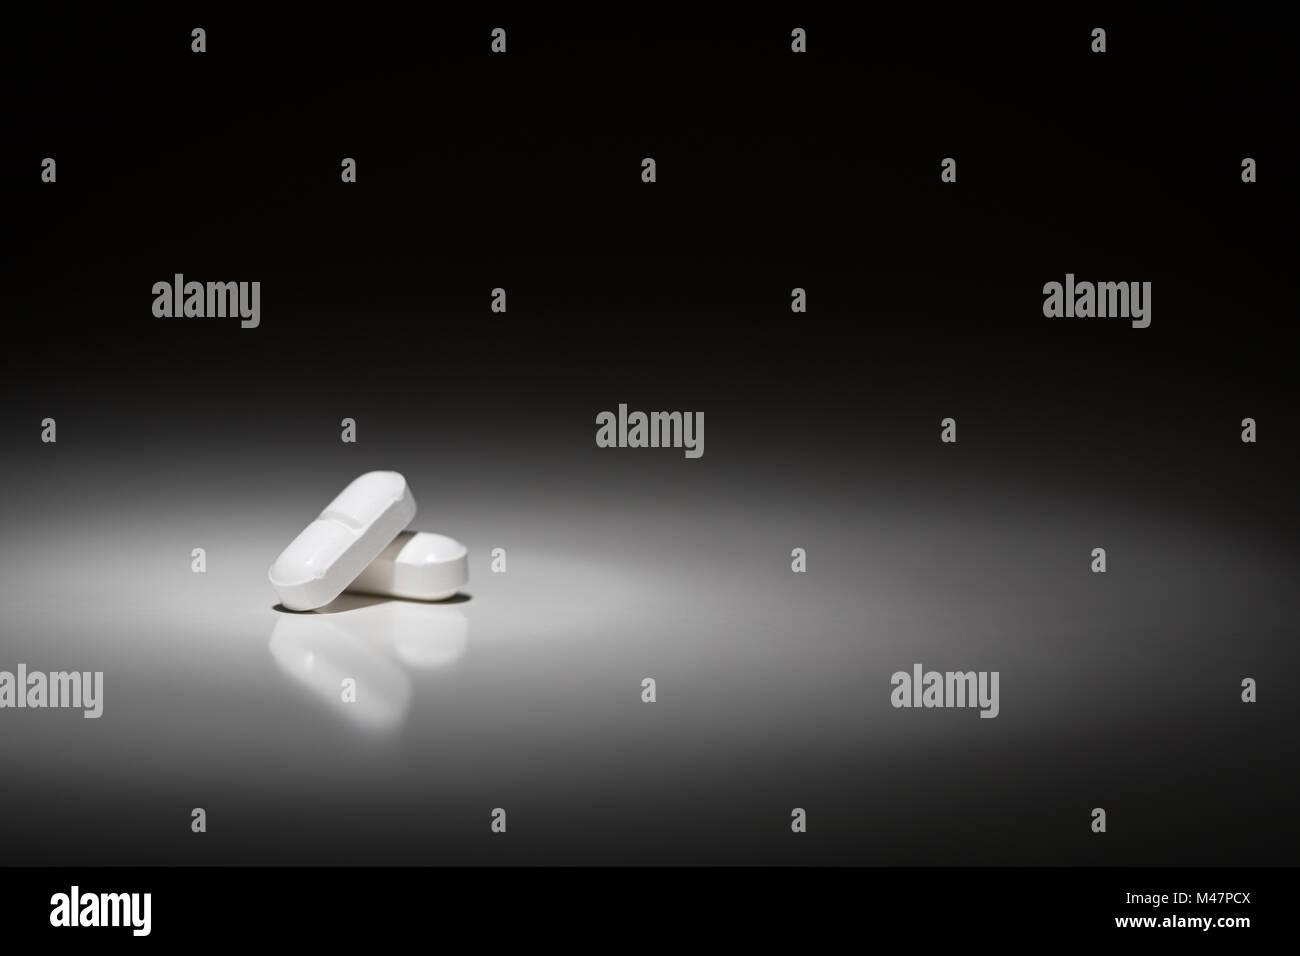 Hydrocodone Prescription Pills Under Spot Light. - Stock Image